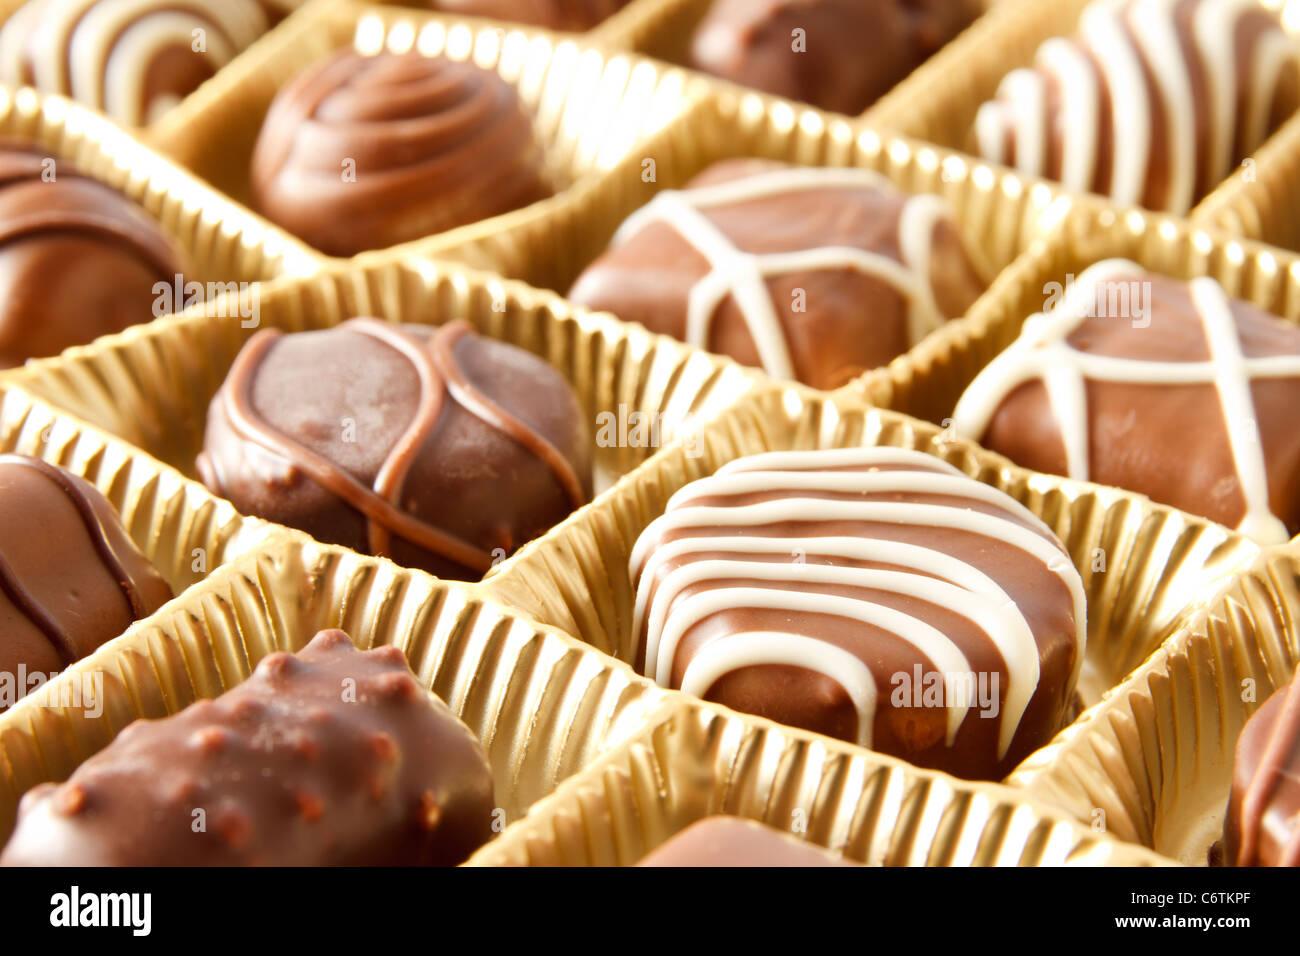 Caja de bombones de chocolate cerrar Imagen De Stock